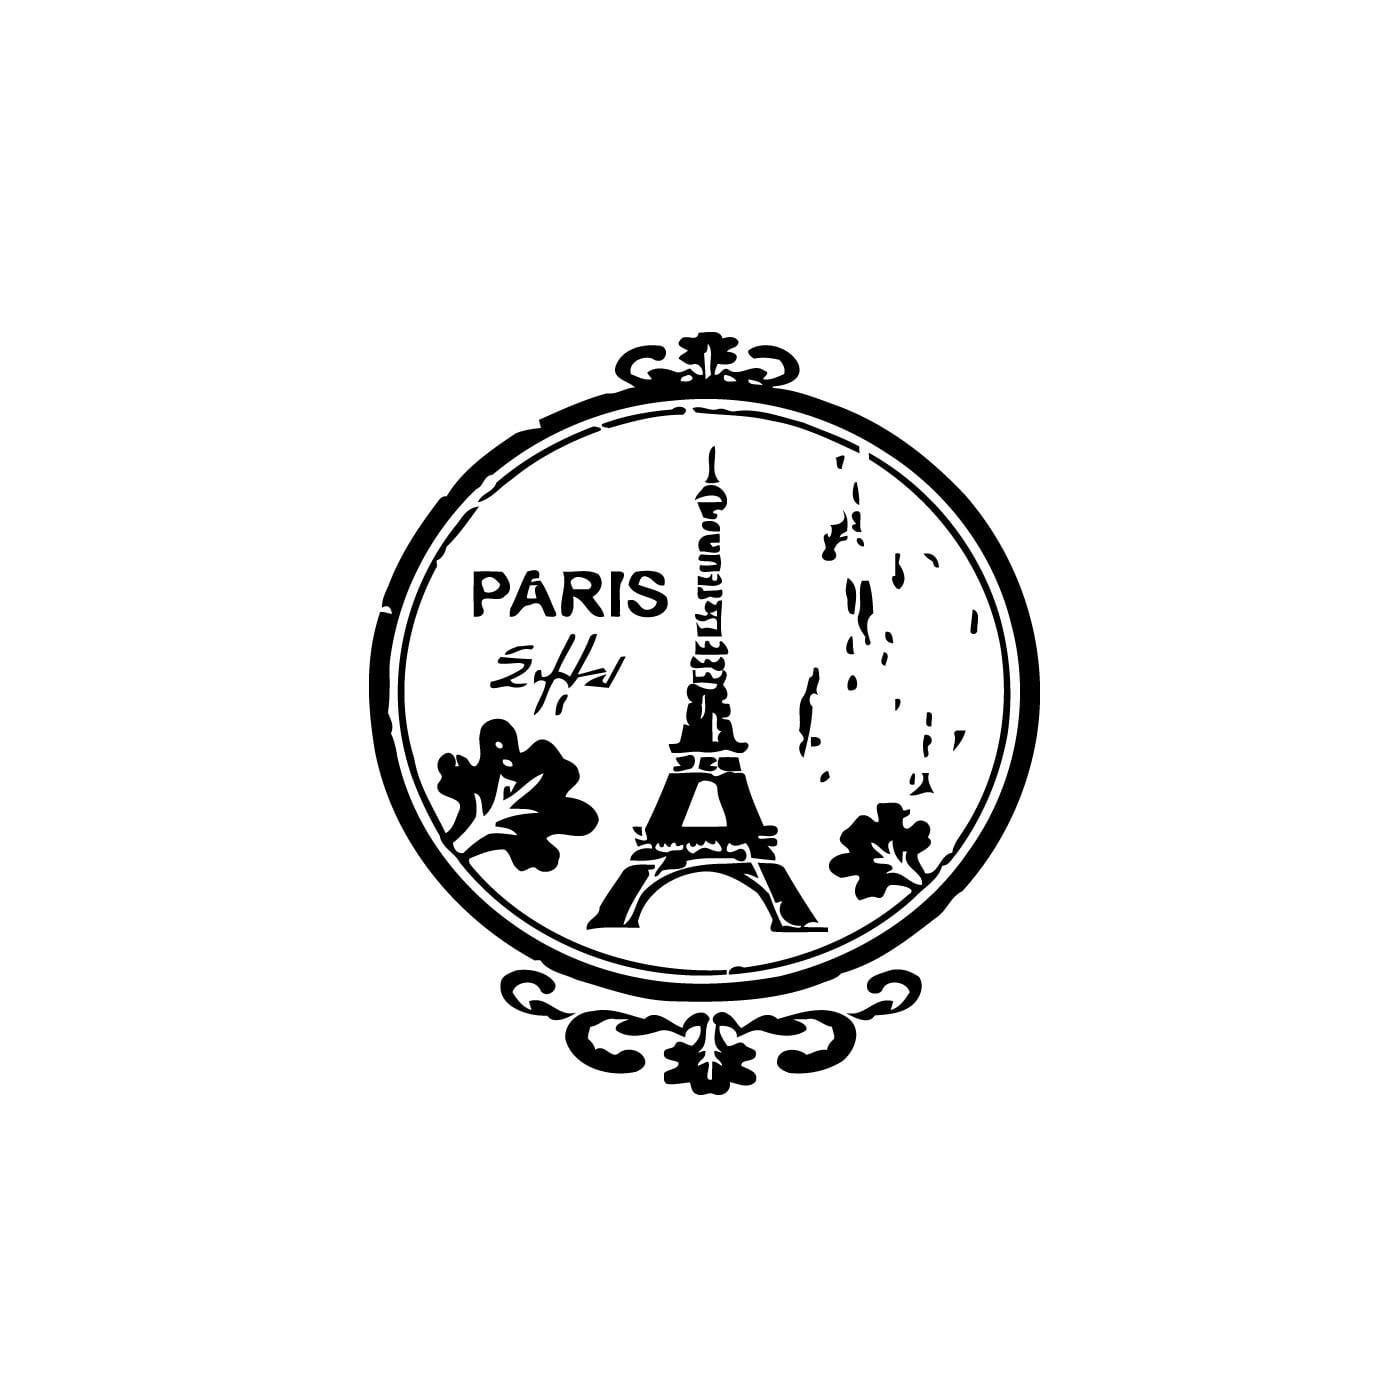 Vsgraphics llc Eiffel Tower Paris France Wall Vinyl Art